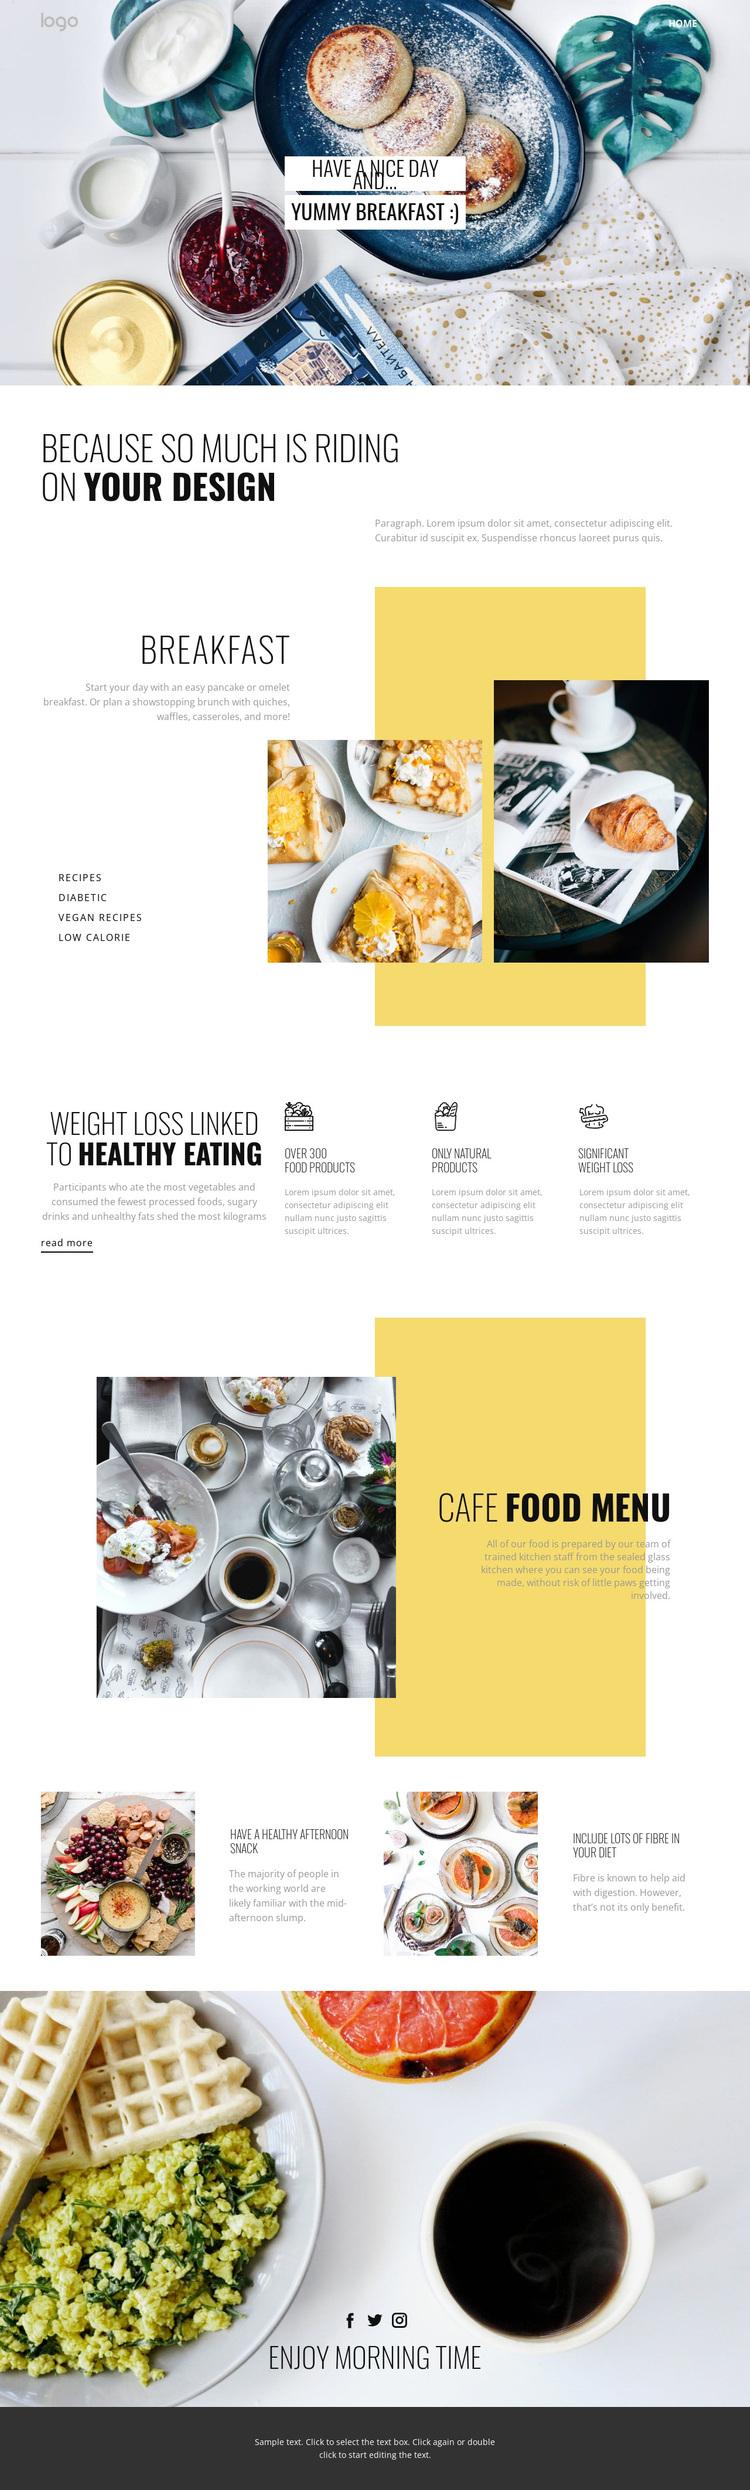 Healthy way of eating food Joomla Page Builder